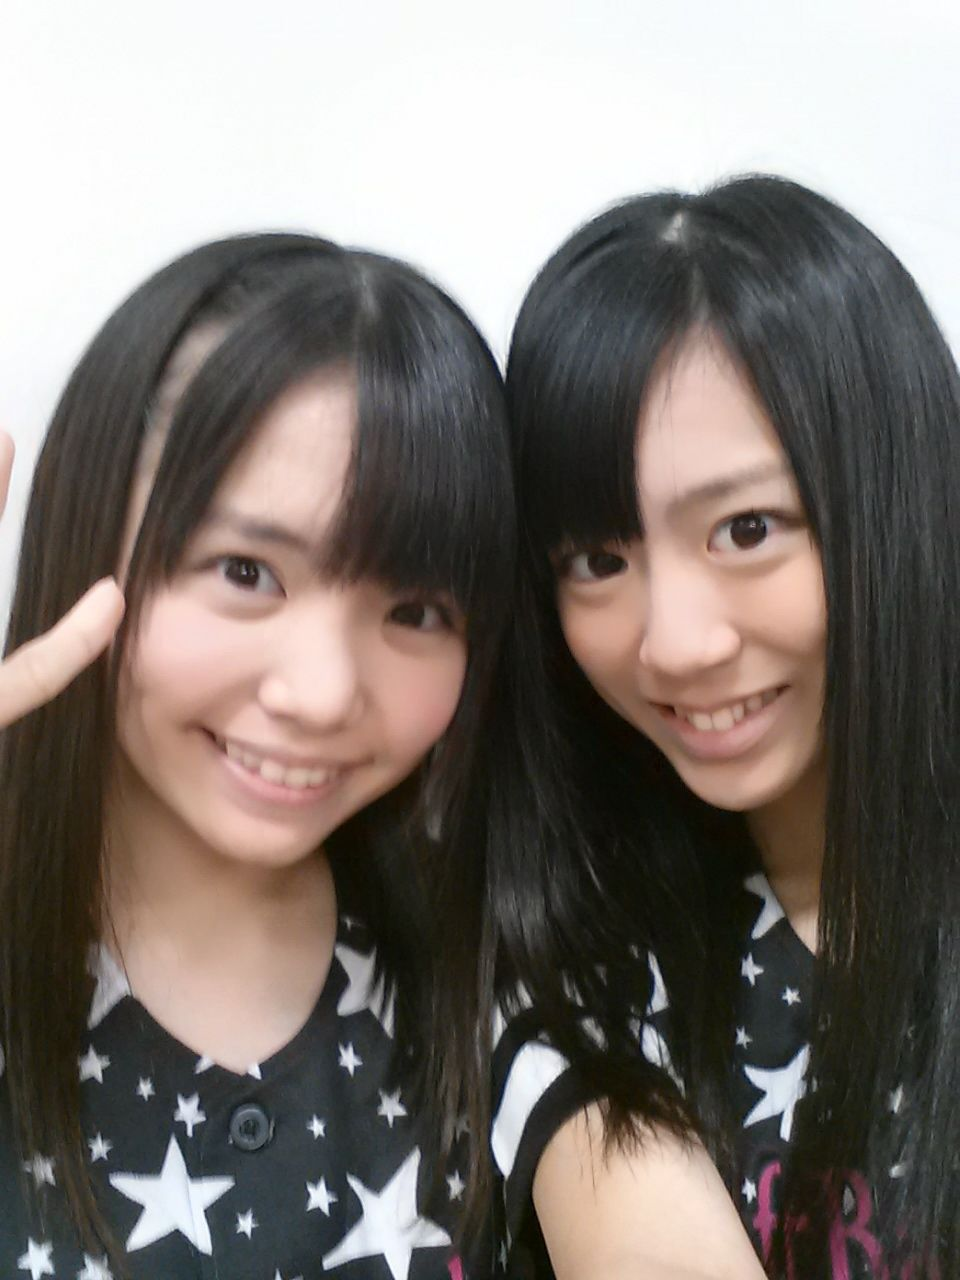 http://livedoor.blogimg.jp/otohaeika/imgs/1/f/1f11268d.jpg